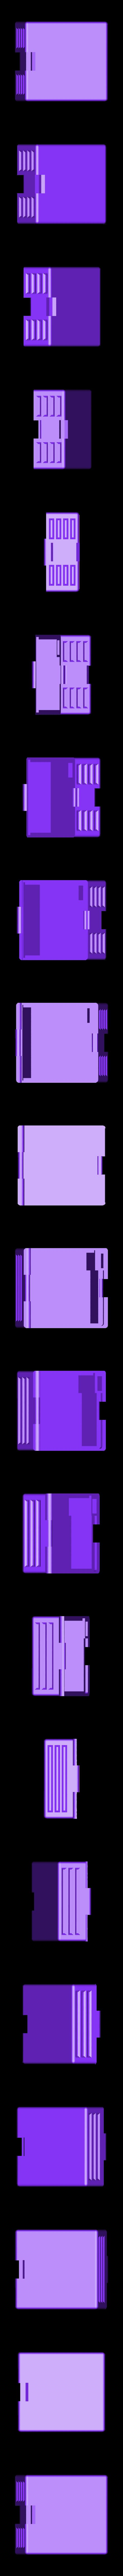 smw_gora.stl Download free STL file 3DConnexion SpaceMouse Wireless BOX • 3D printing template, kpawel